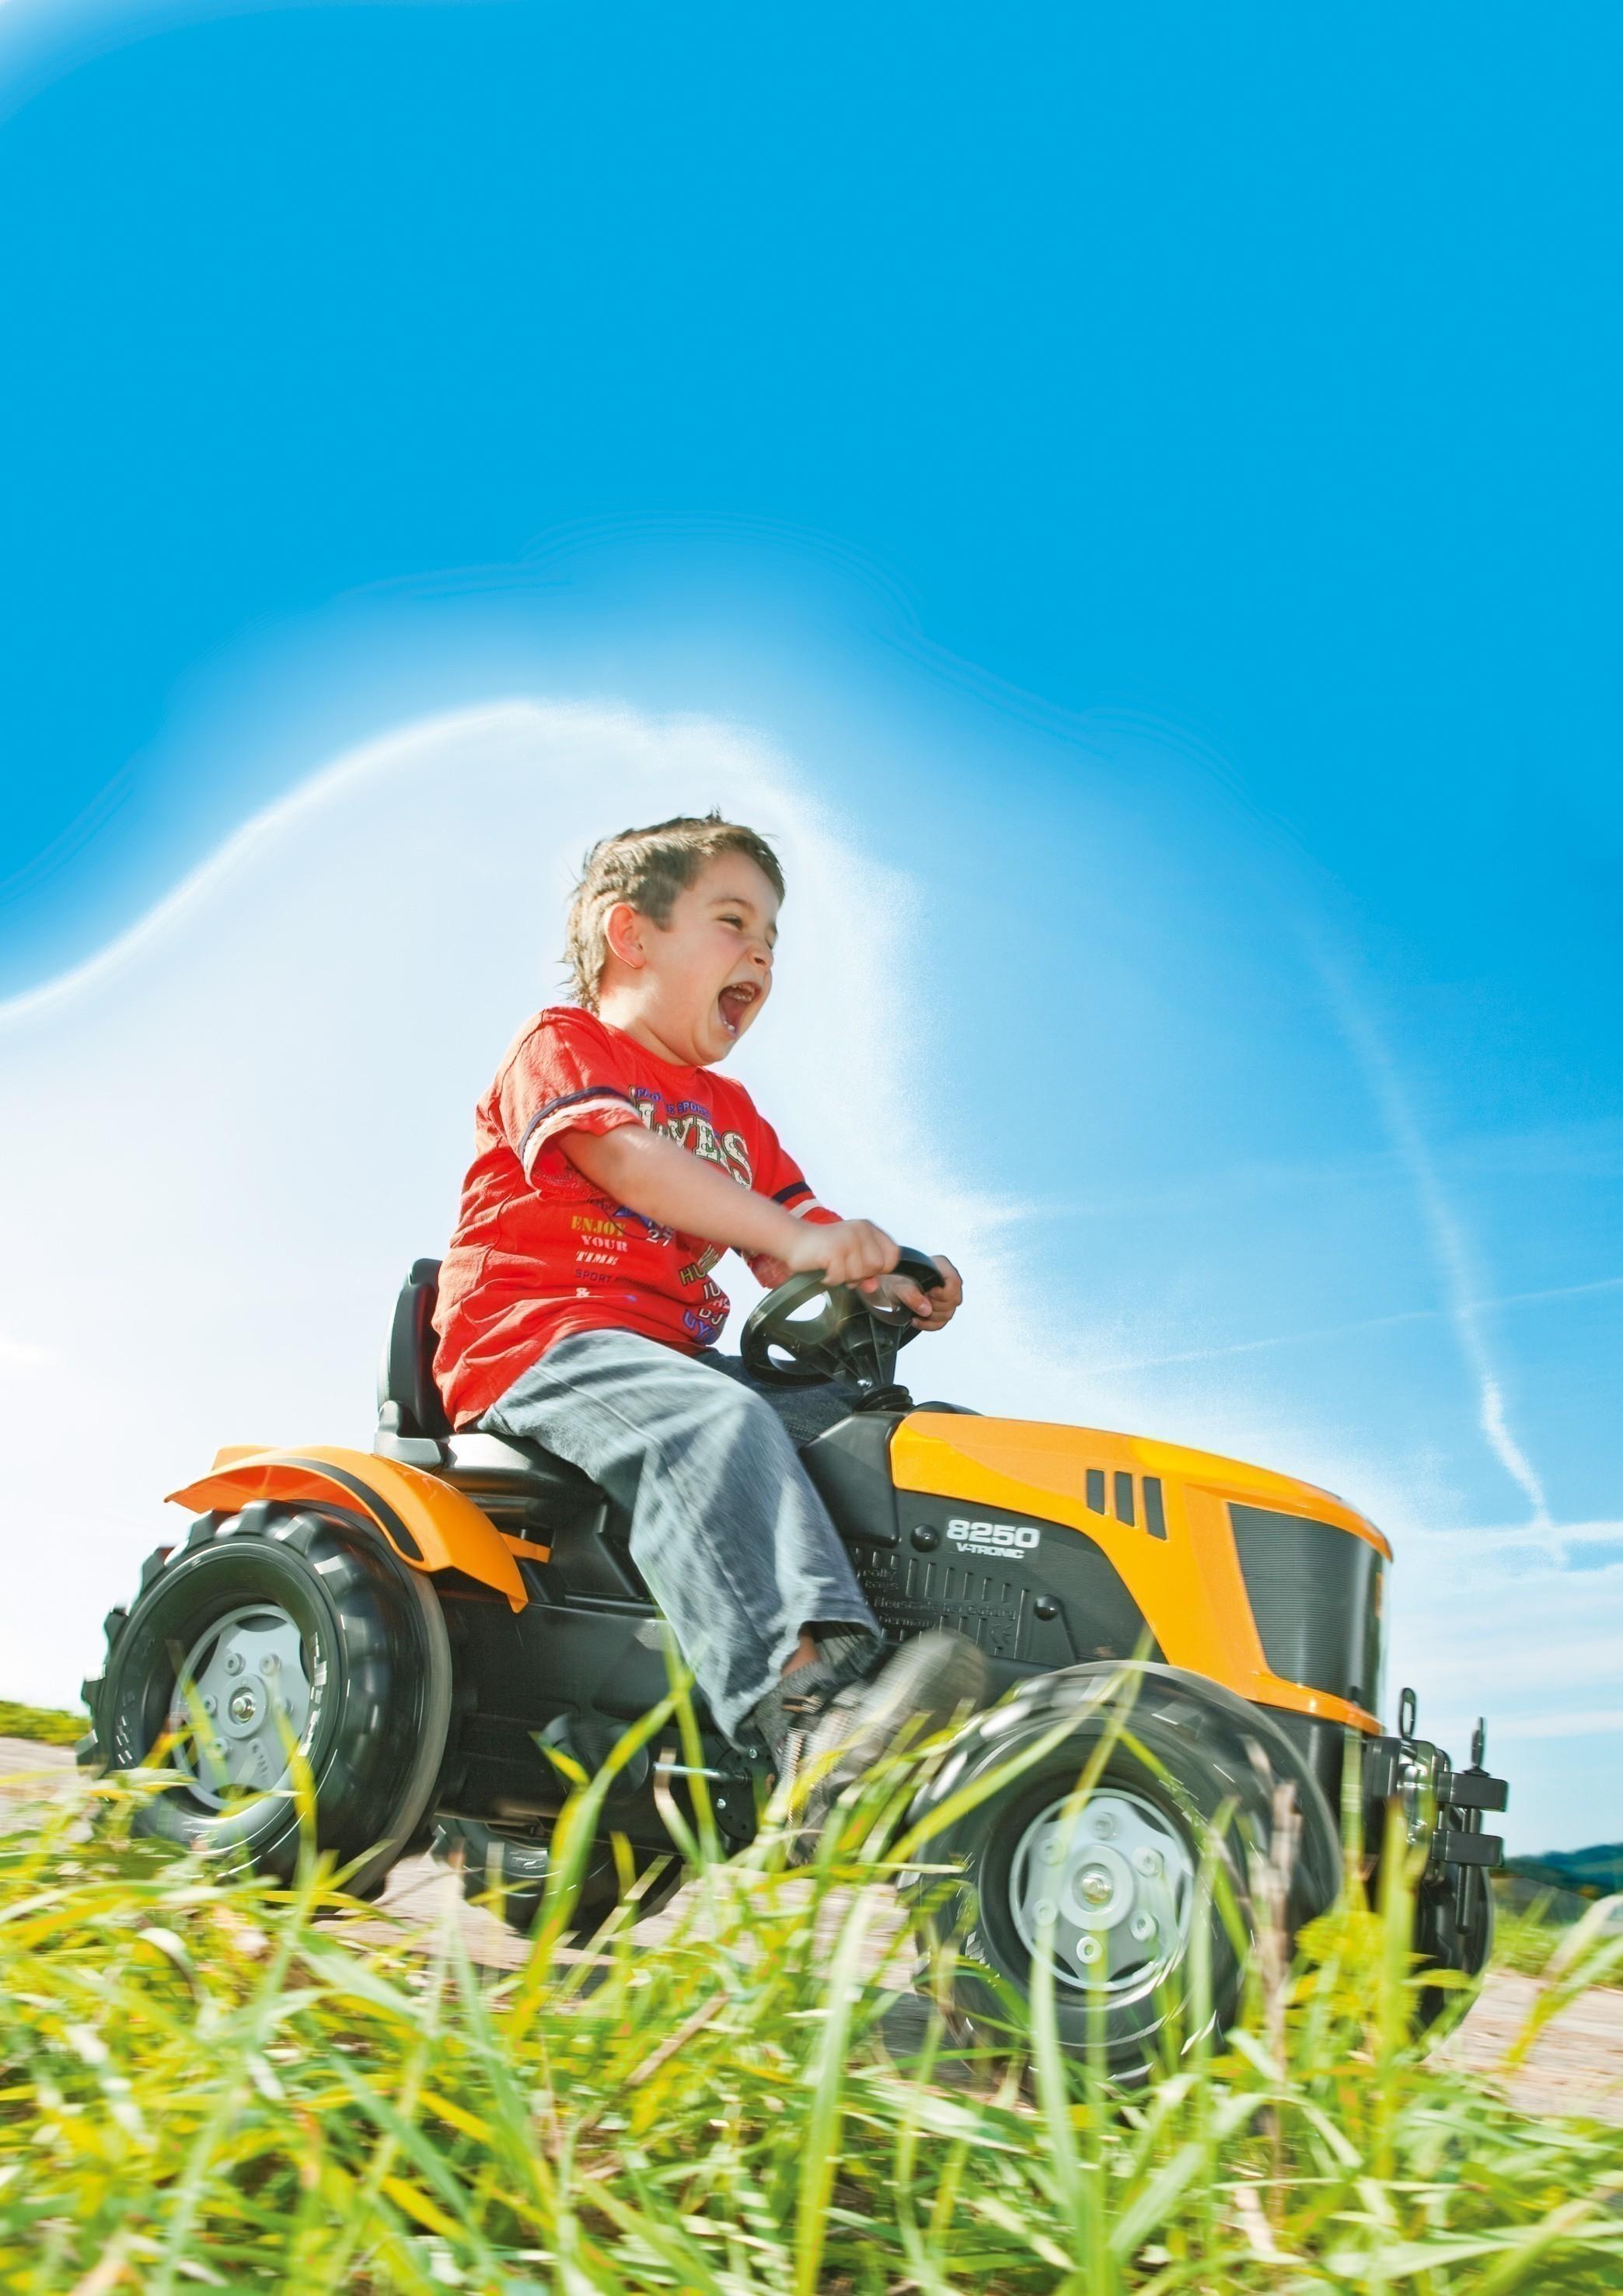 Trettraktor rolly Farmtrac JCB 8250  - Rolly Toys Bild 3